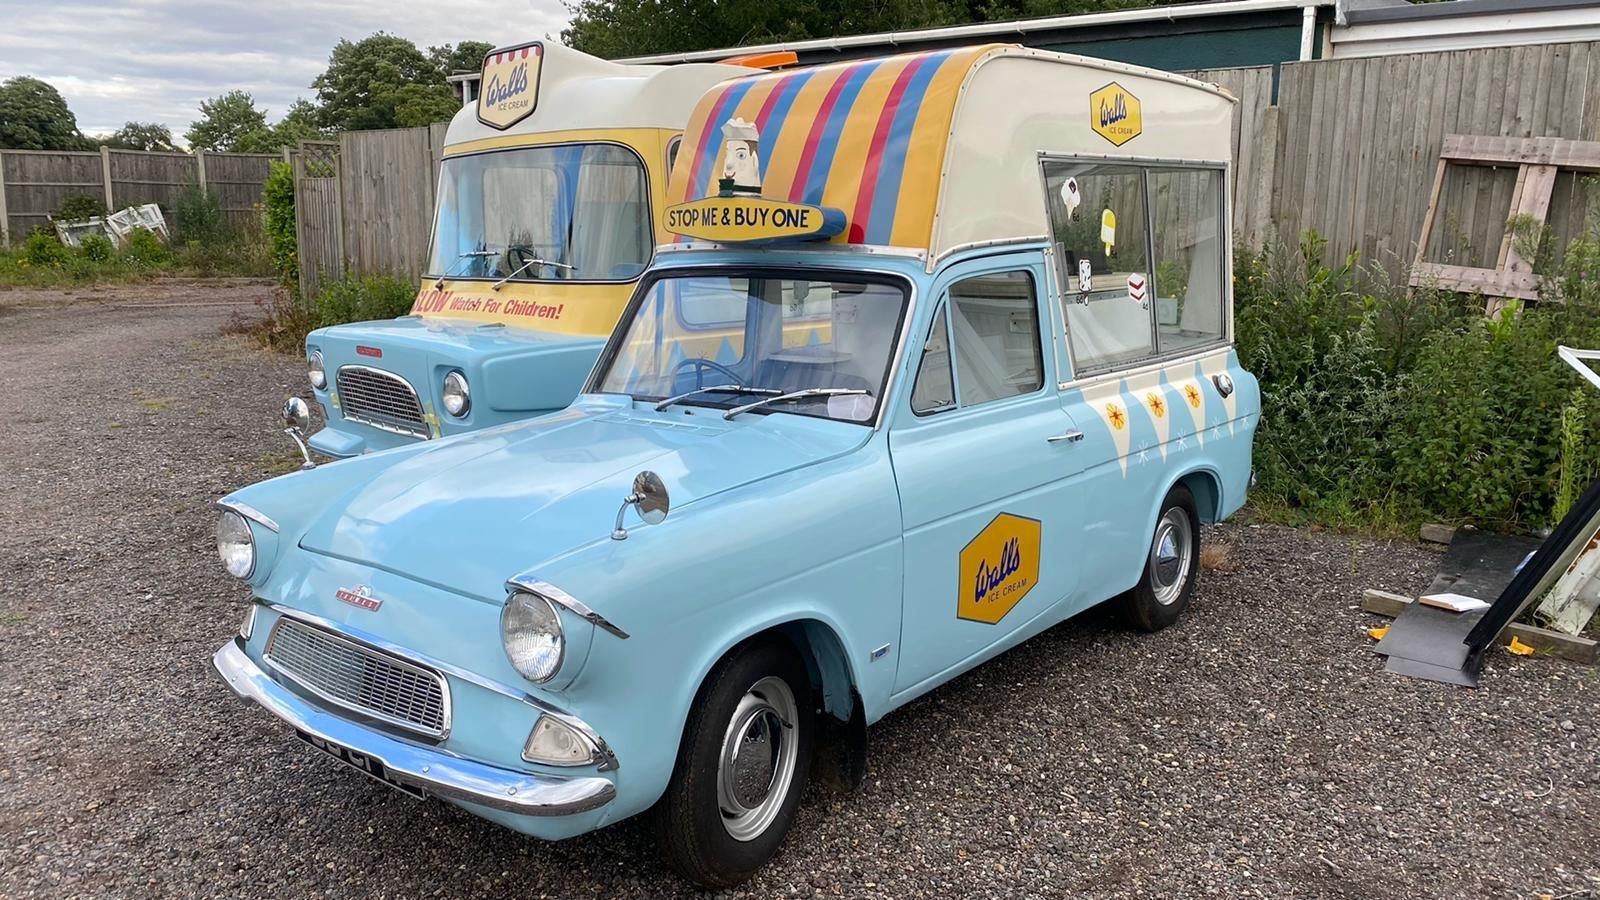 1963 Ford Anglia Rare Martin Walter Ice Cream Van For Sale (picture 1 of 3)